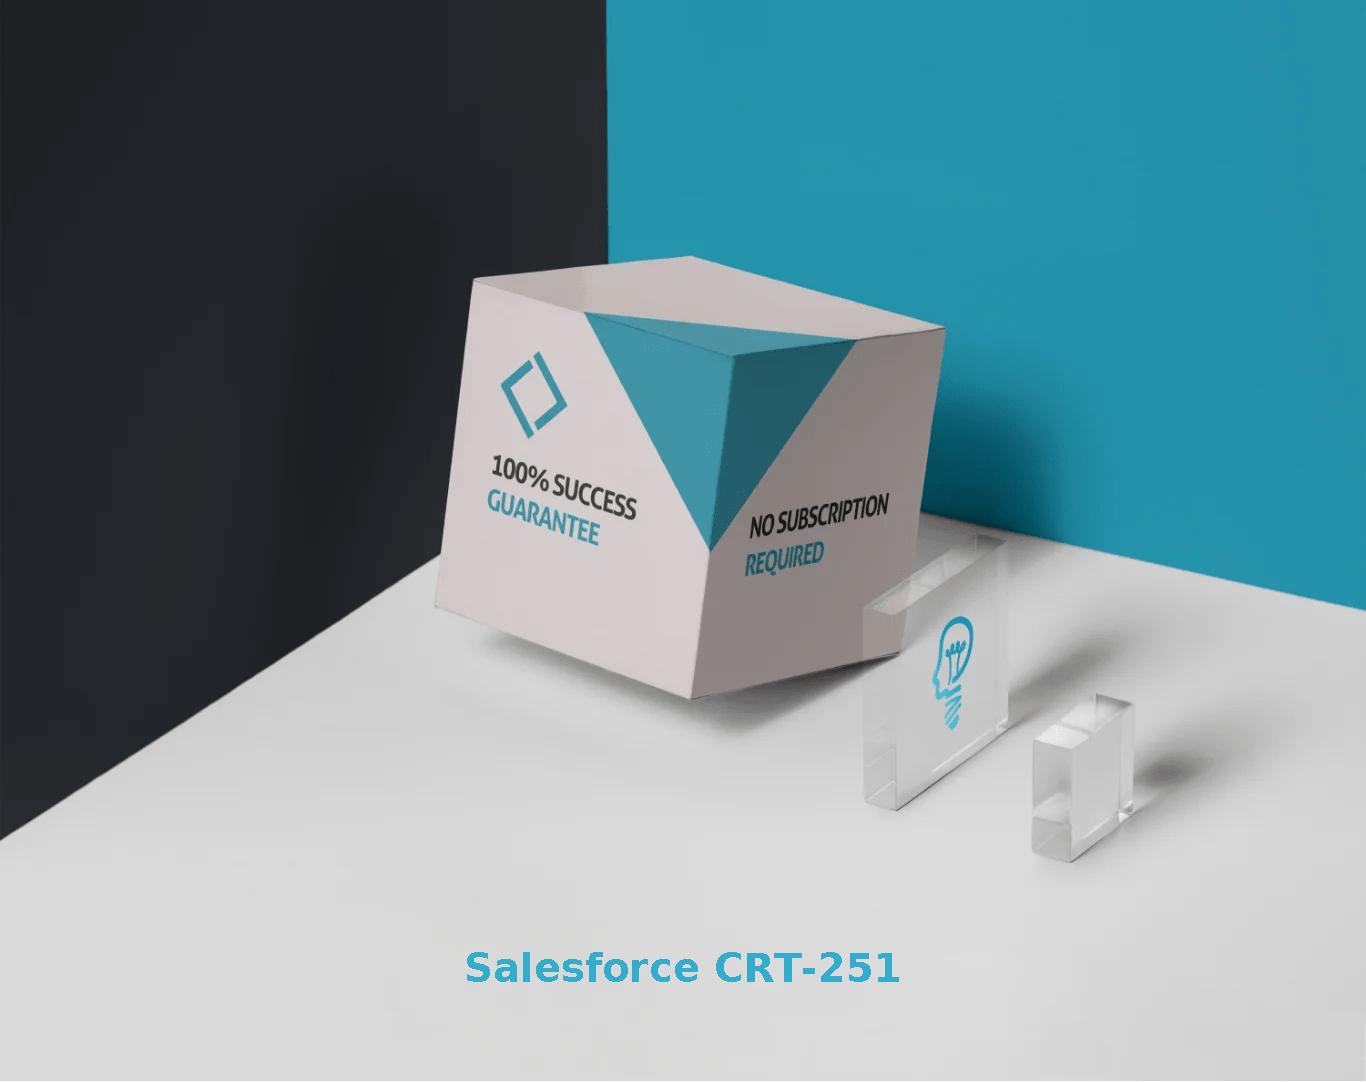 Salesforce CRT-251 Exams